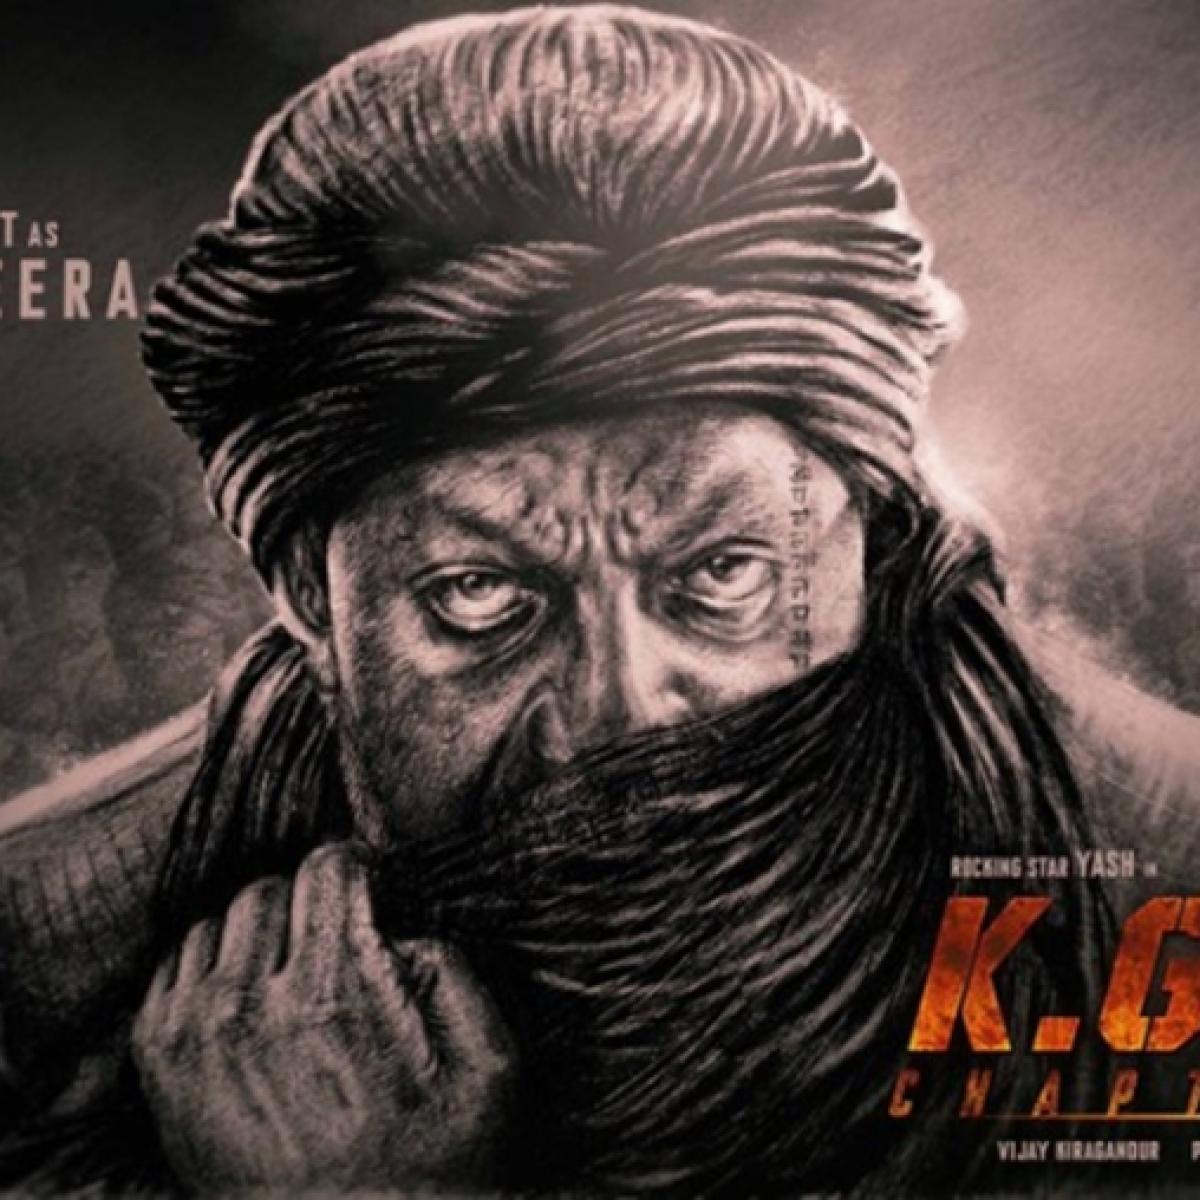 Sanjay Dutt starrer 'KGF: Chapter 2' gets October release date